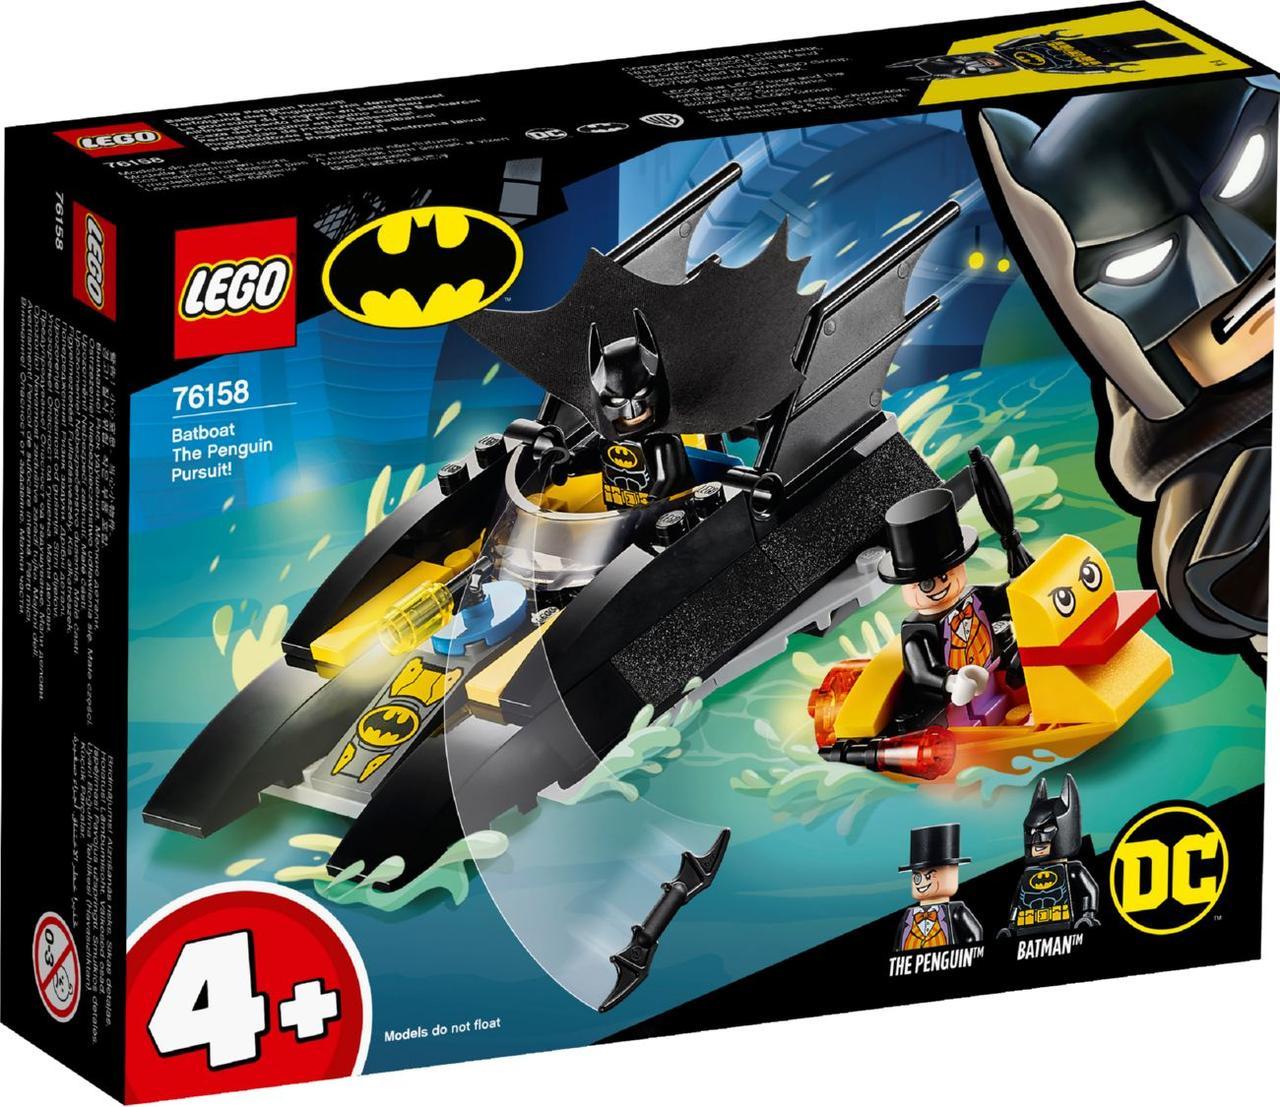 Lego Super Heroes Погоня за Пингвином на Бэткатере 76158